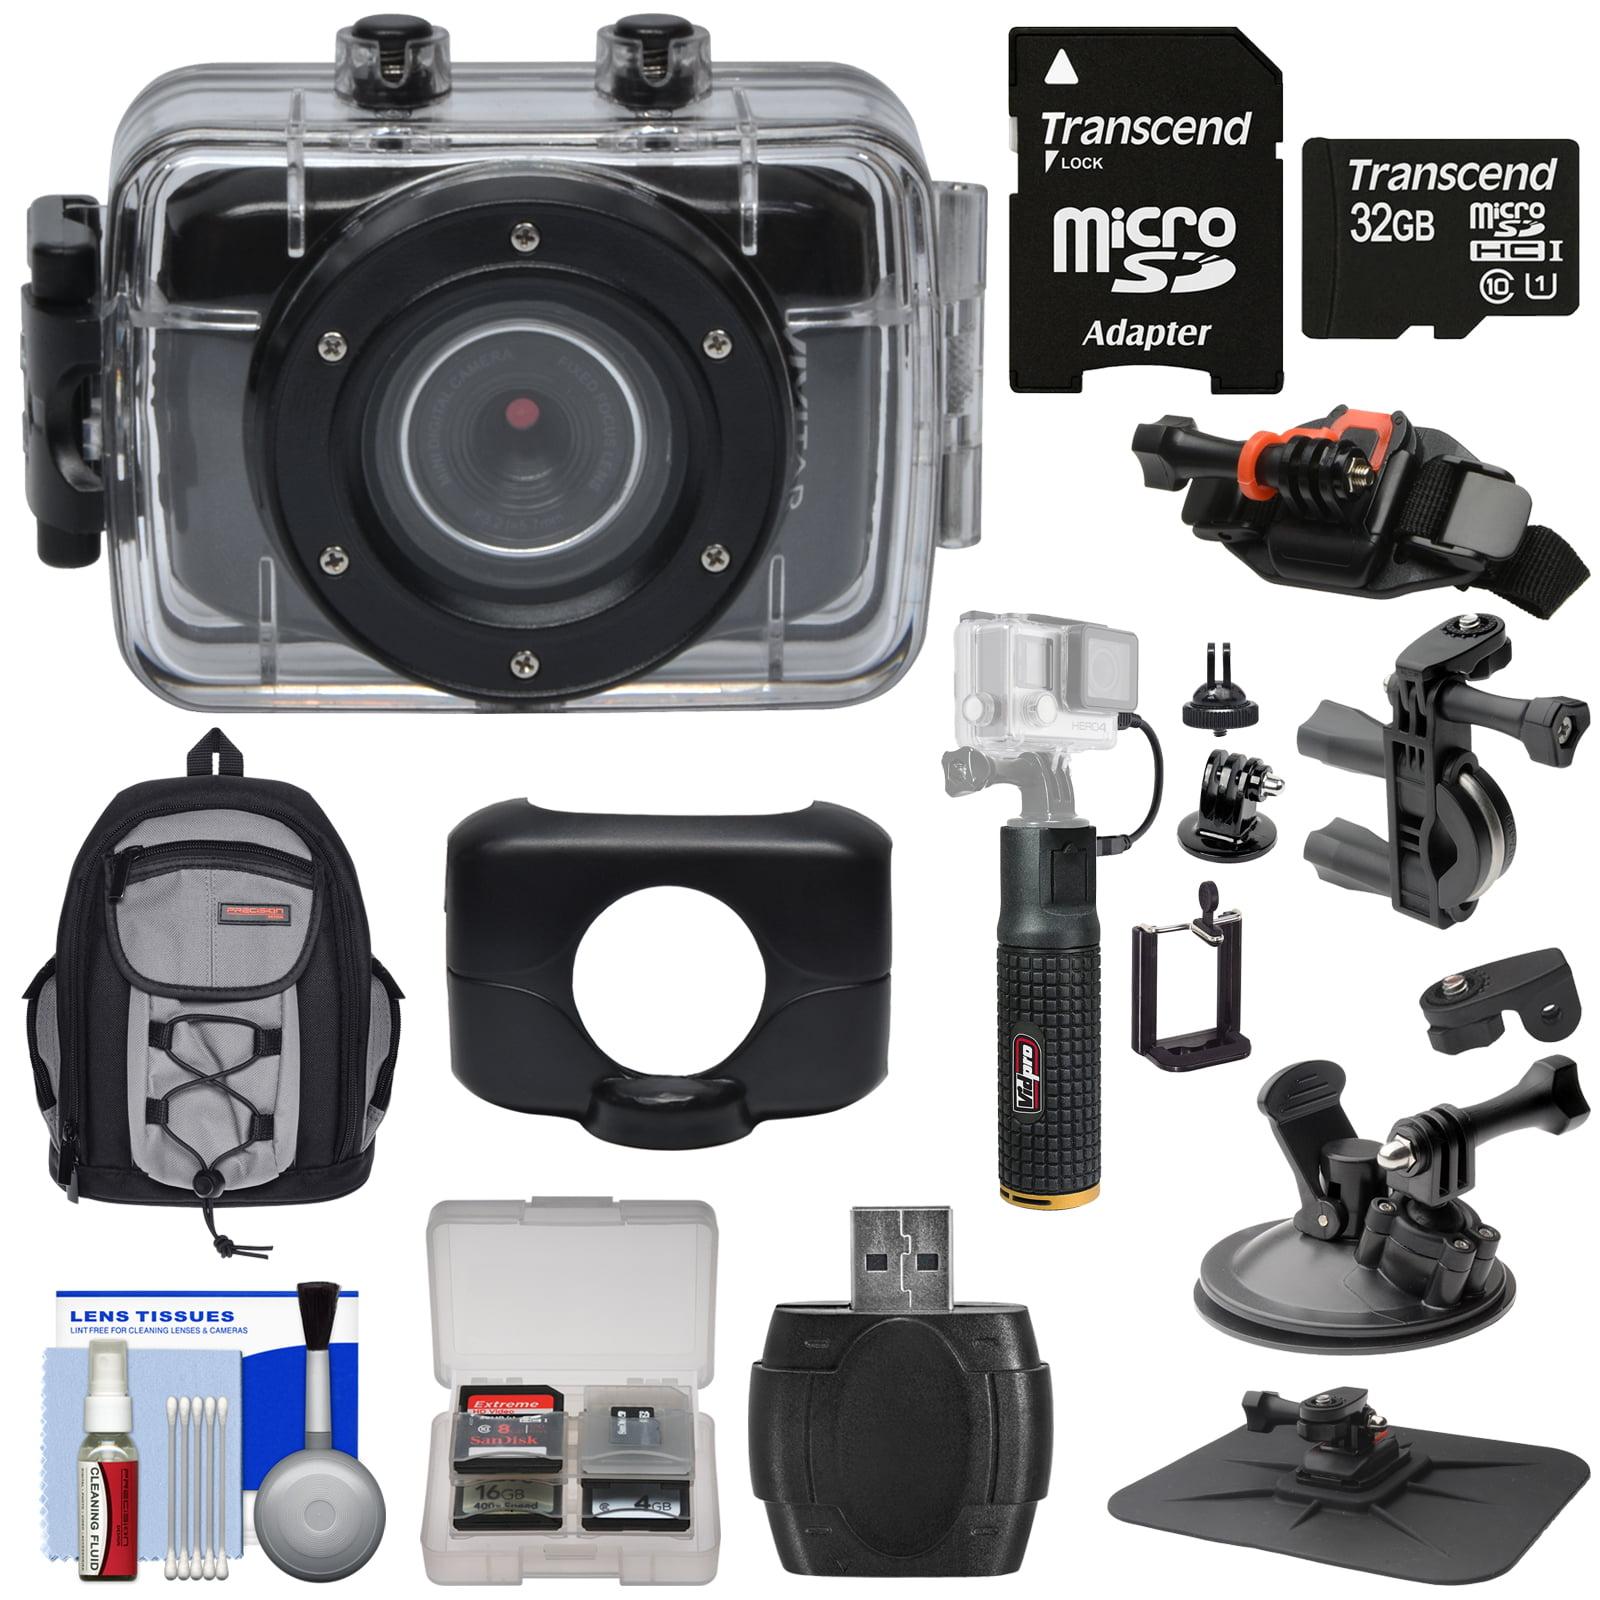 Vivitar DVR781HD HD Waterproof Action Video Camera Camcorder (Black) with 32GB Card + Suction Cup, Helmet, Bike Mounts + Backpack + Battery Grip Kit